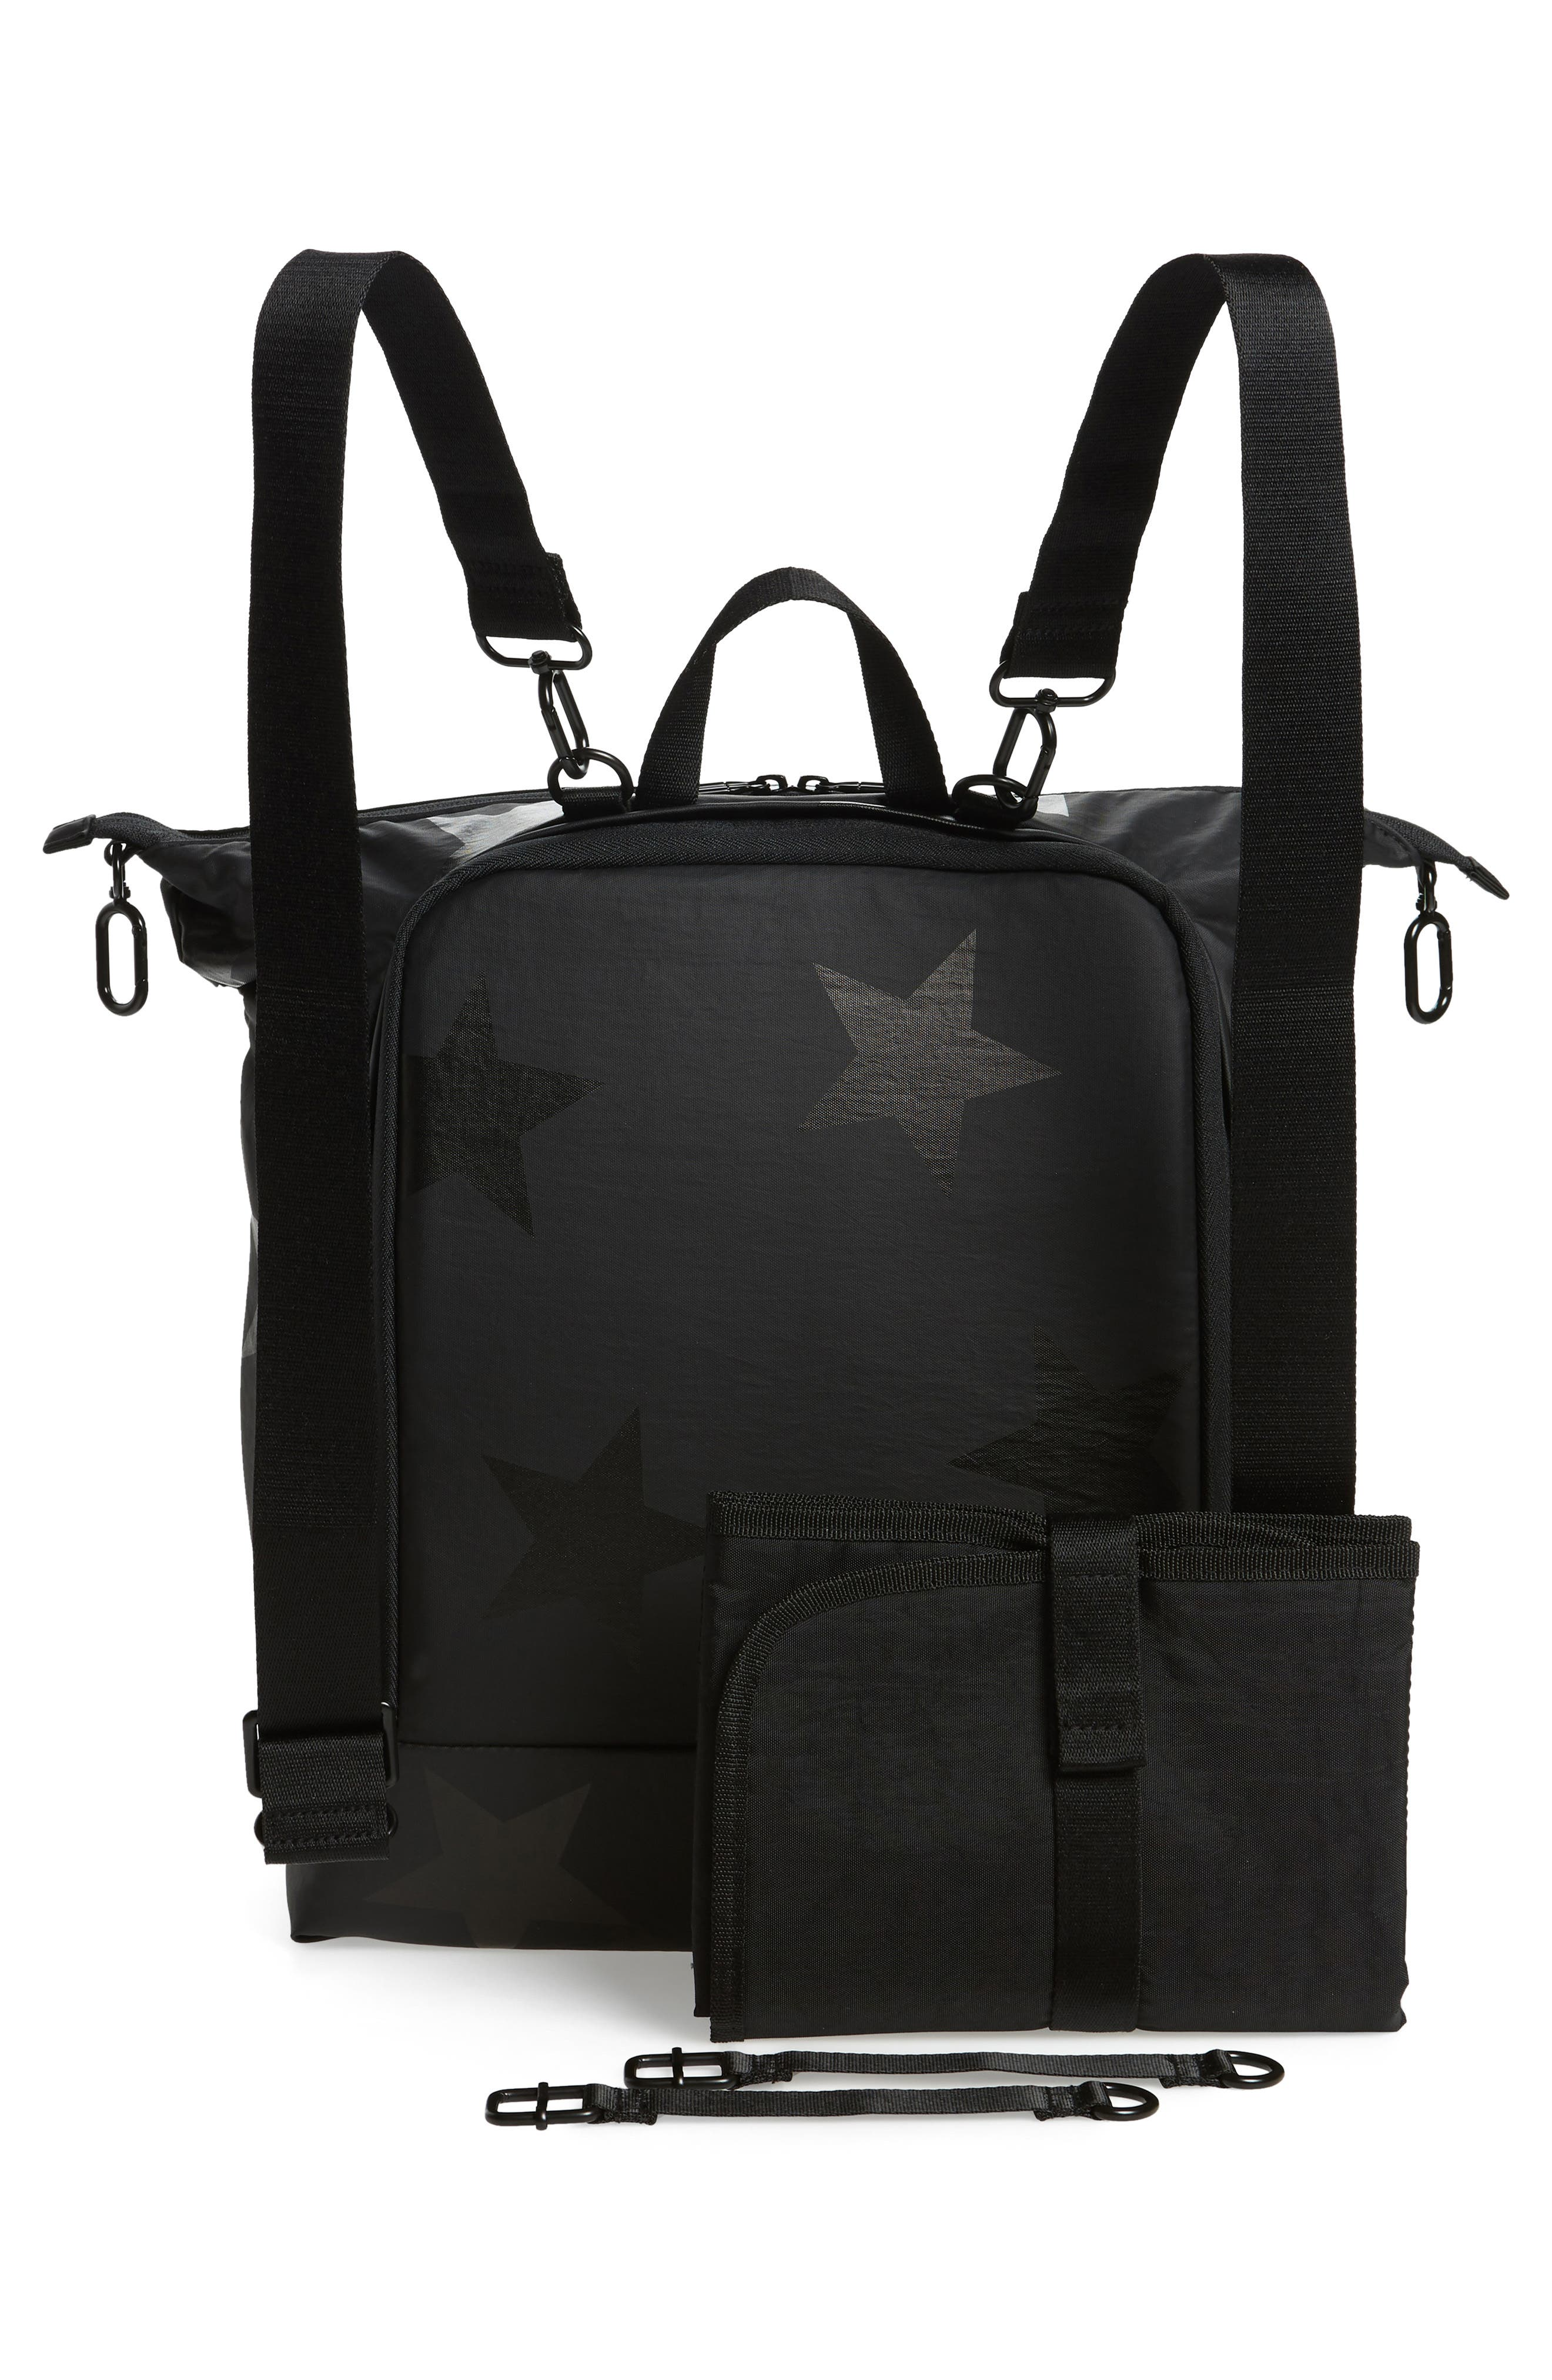 +one duo Nylon Convertible Diaper Bag,                             Alternate thumbnail 3, color,                             BLACK STAR